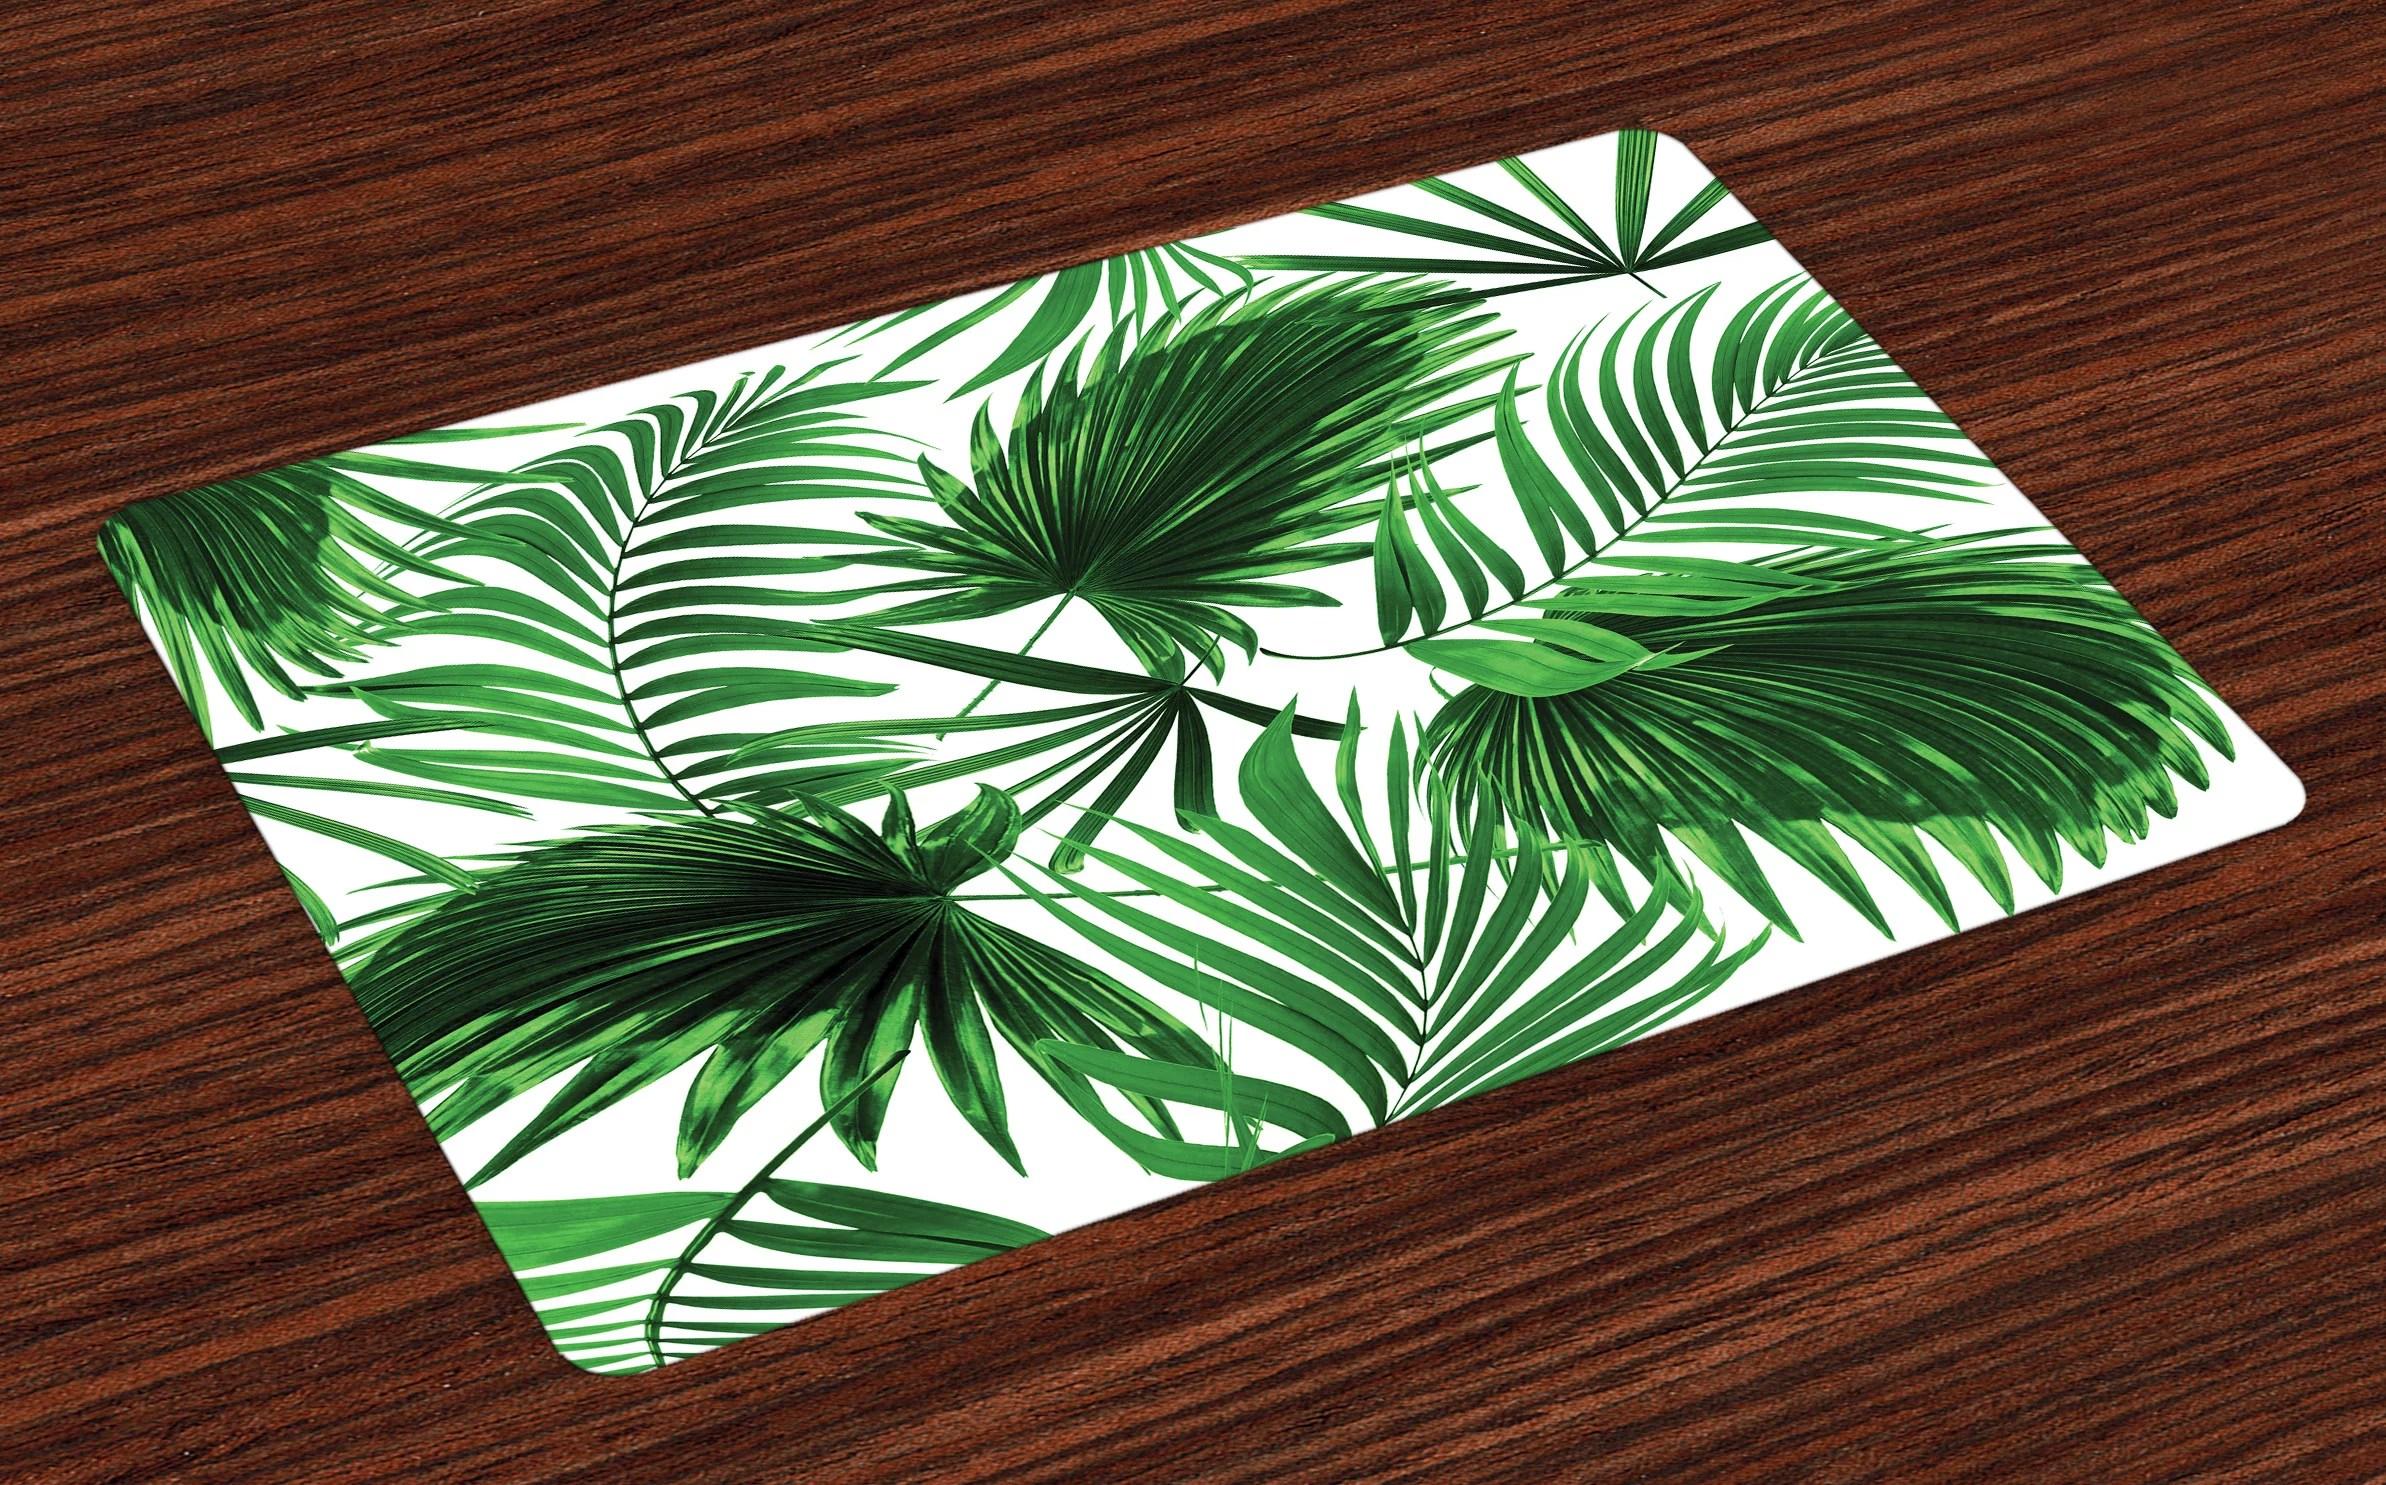 palm tree kitchen decor white set leaf placemats of 4 realistic vivid leaves